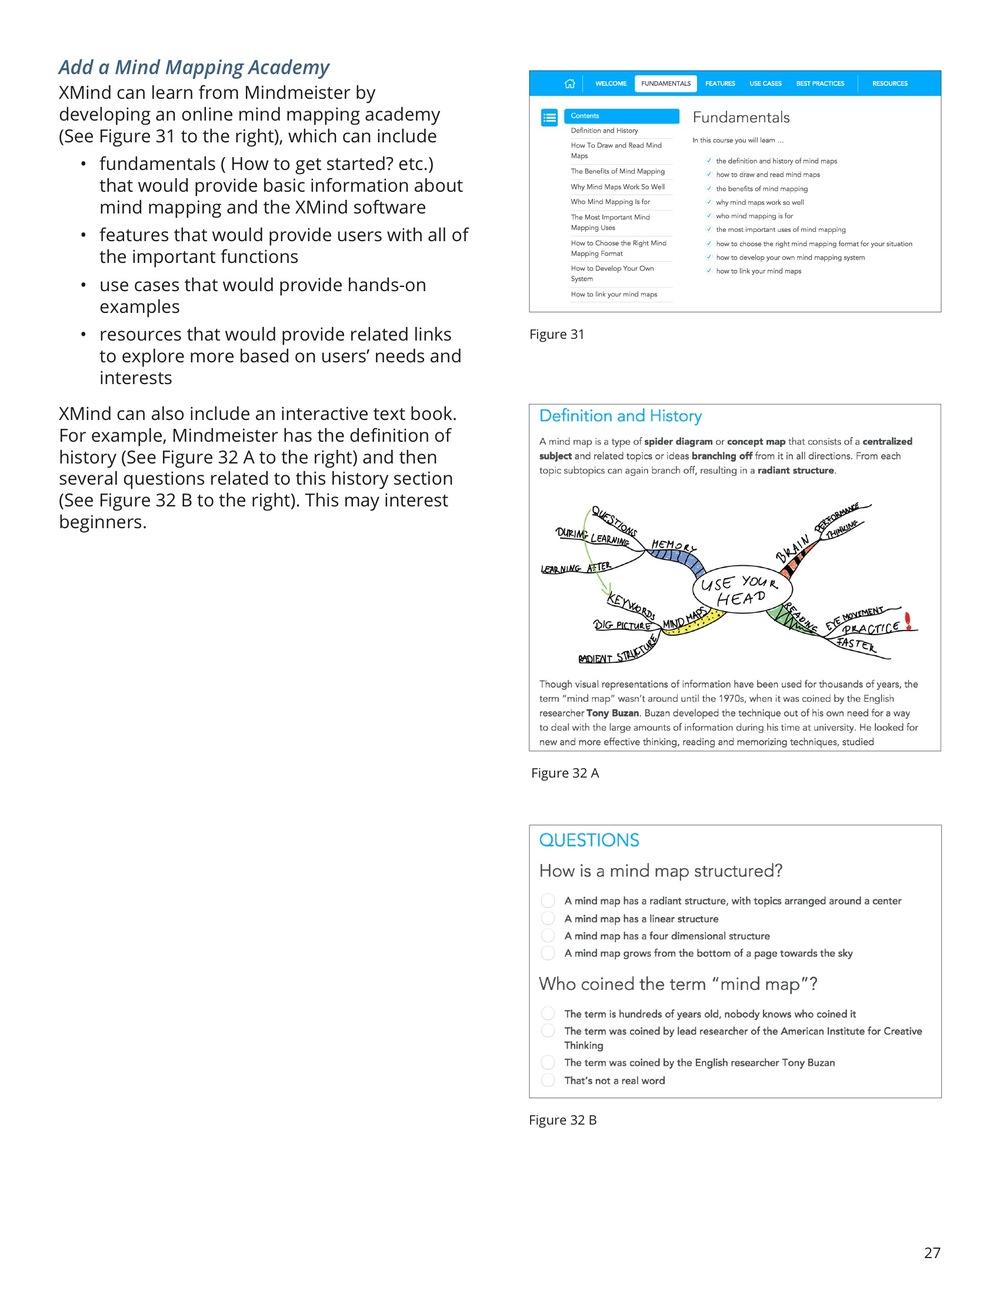 XMind Final Report_4-23-15 27-27.jpeg